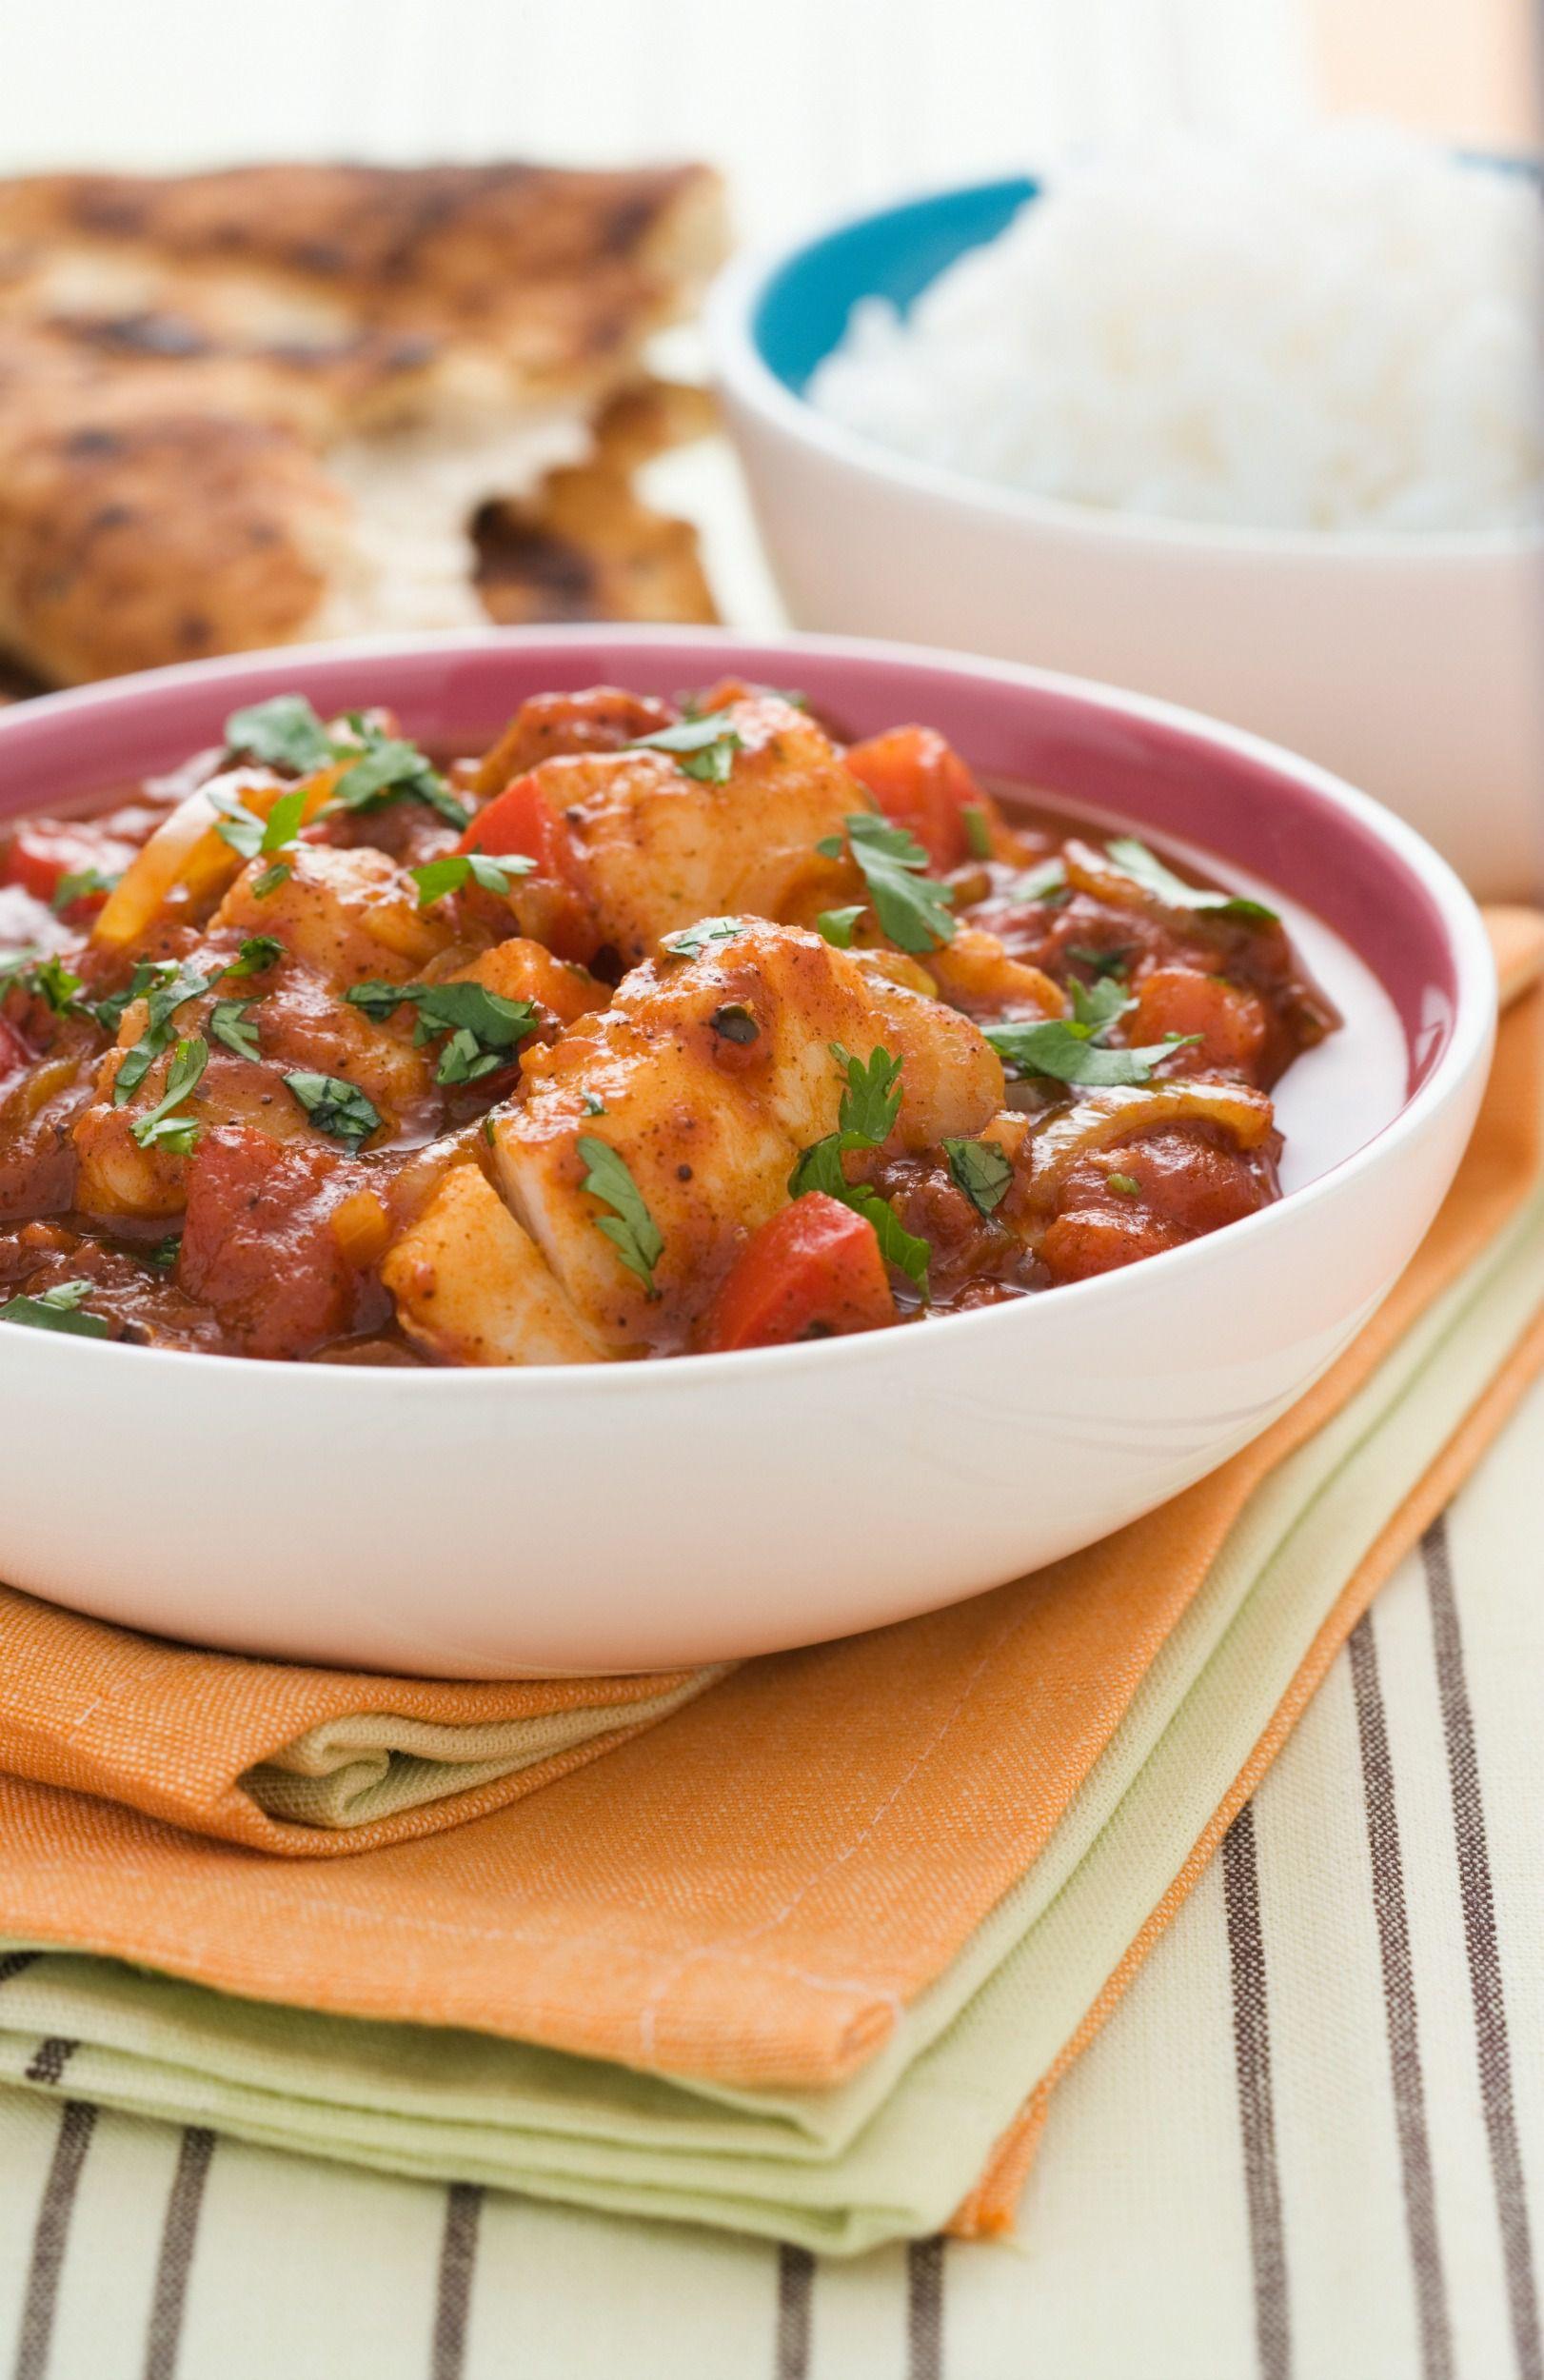 Creamy, Tangy Fish Curry - Fish Makhani